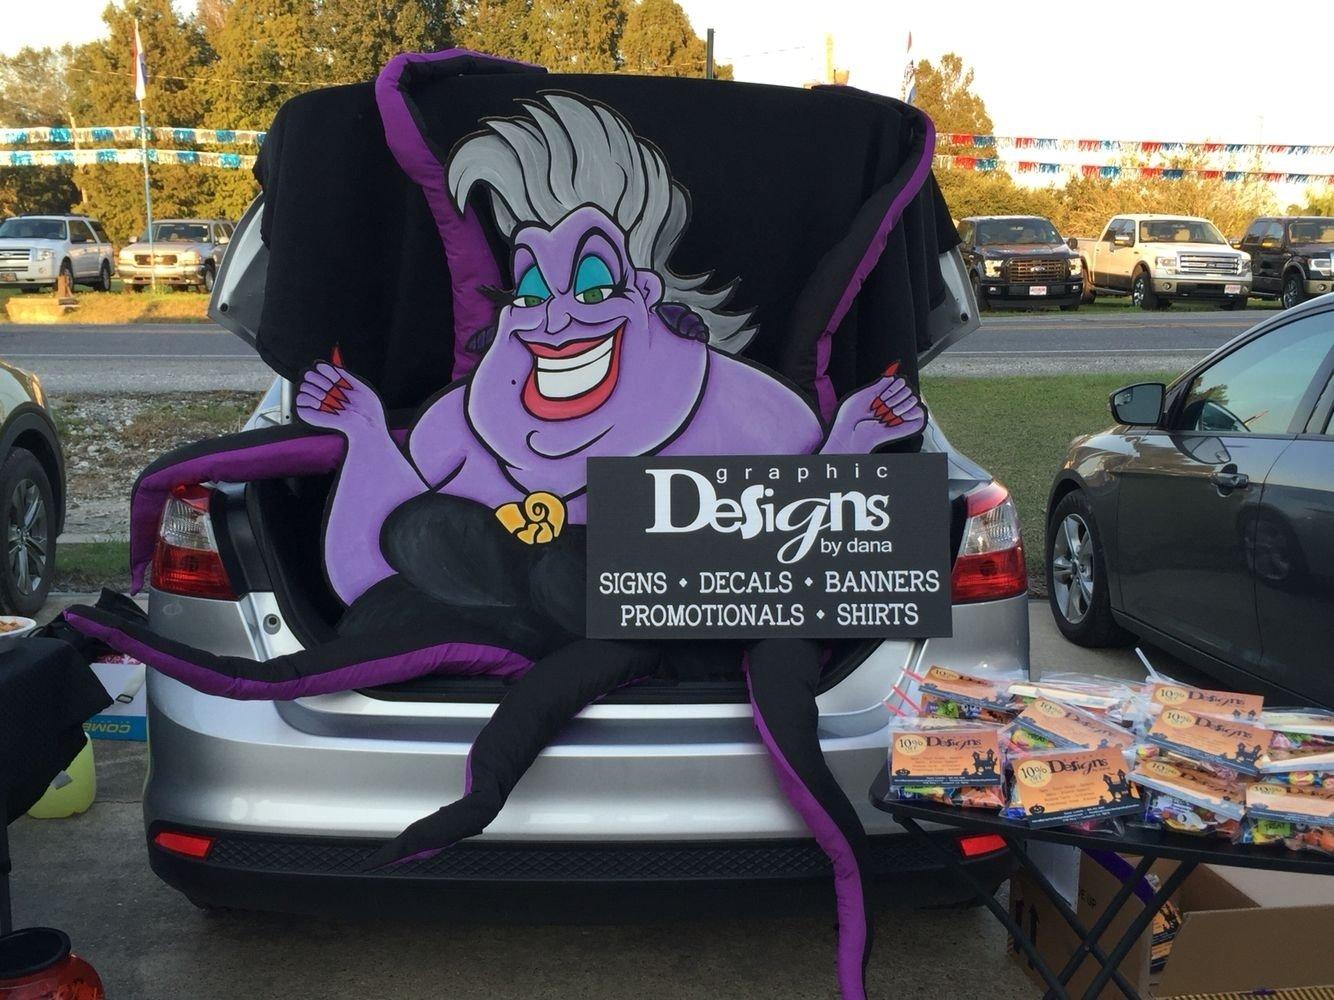 10 Nice Halloween Trunk Or Treat Ideas disney villain trunk or treat disneyvillain trunkortreat ursula 4 2020